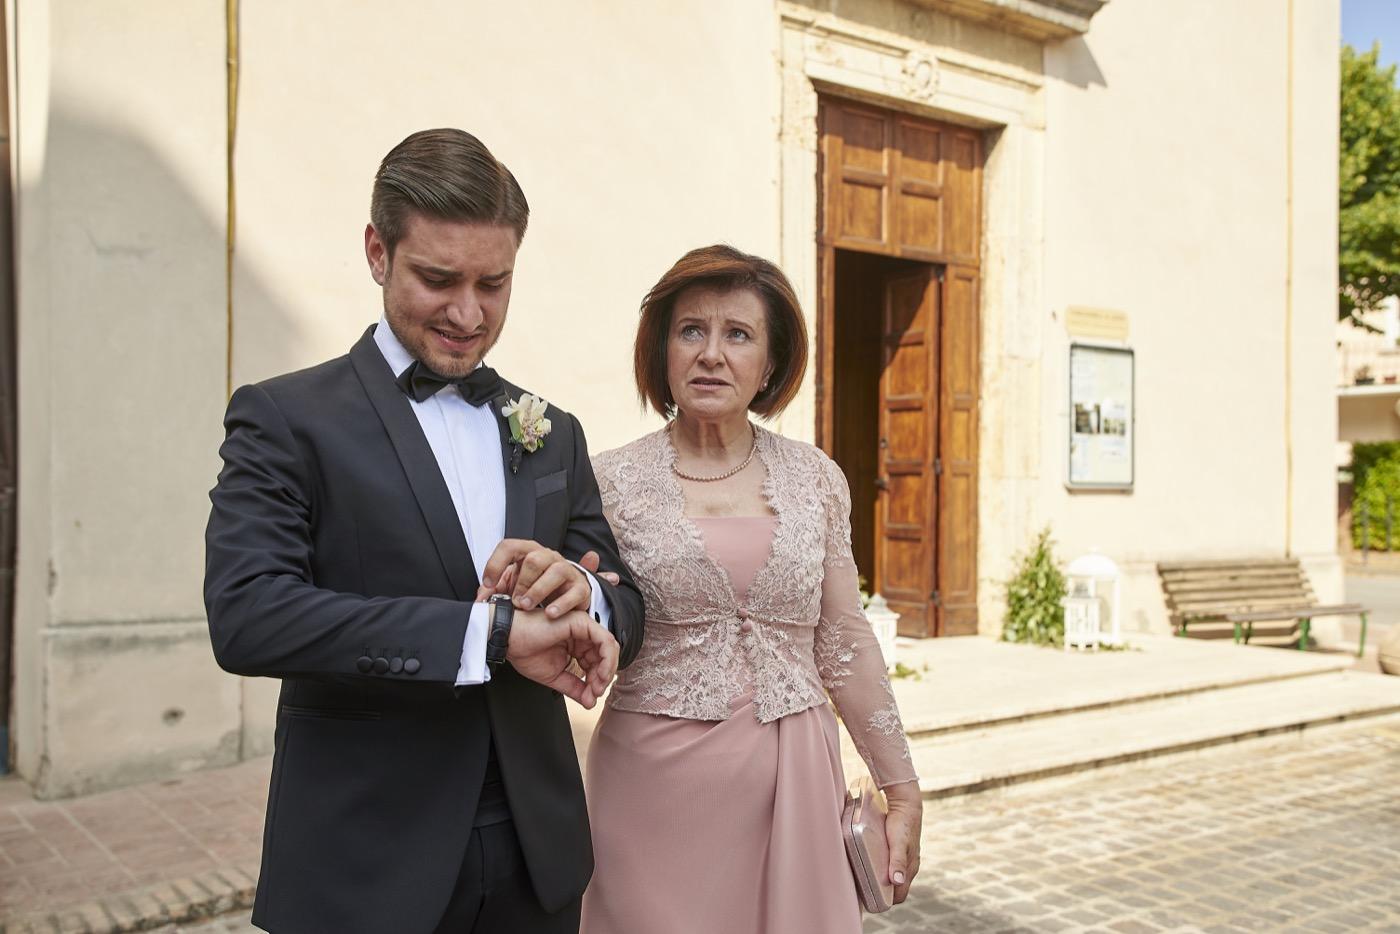 Claudio-Coppola-wedding-photographer-abbazia-7-frati-piegaro-22